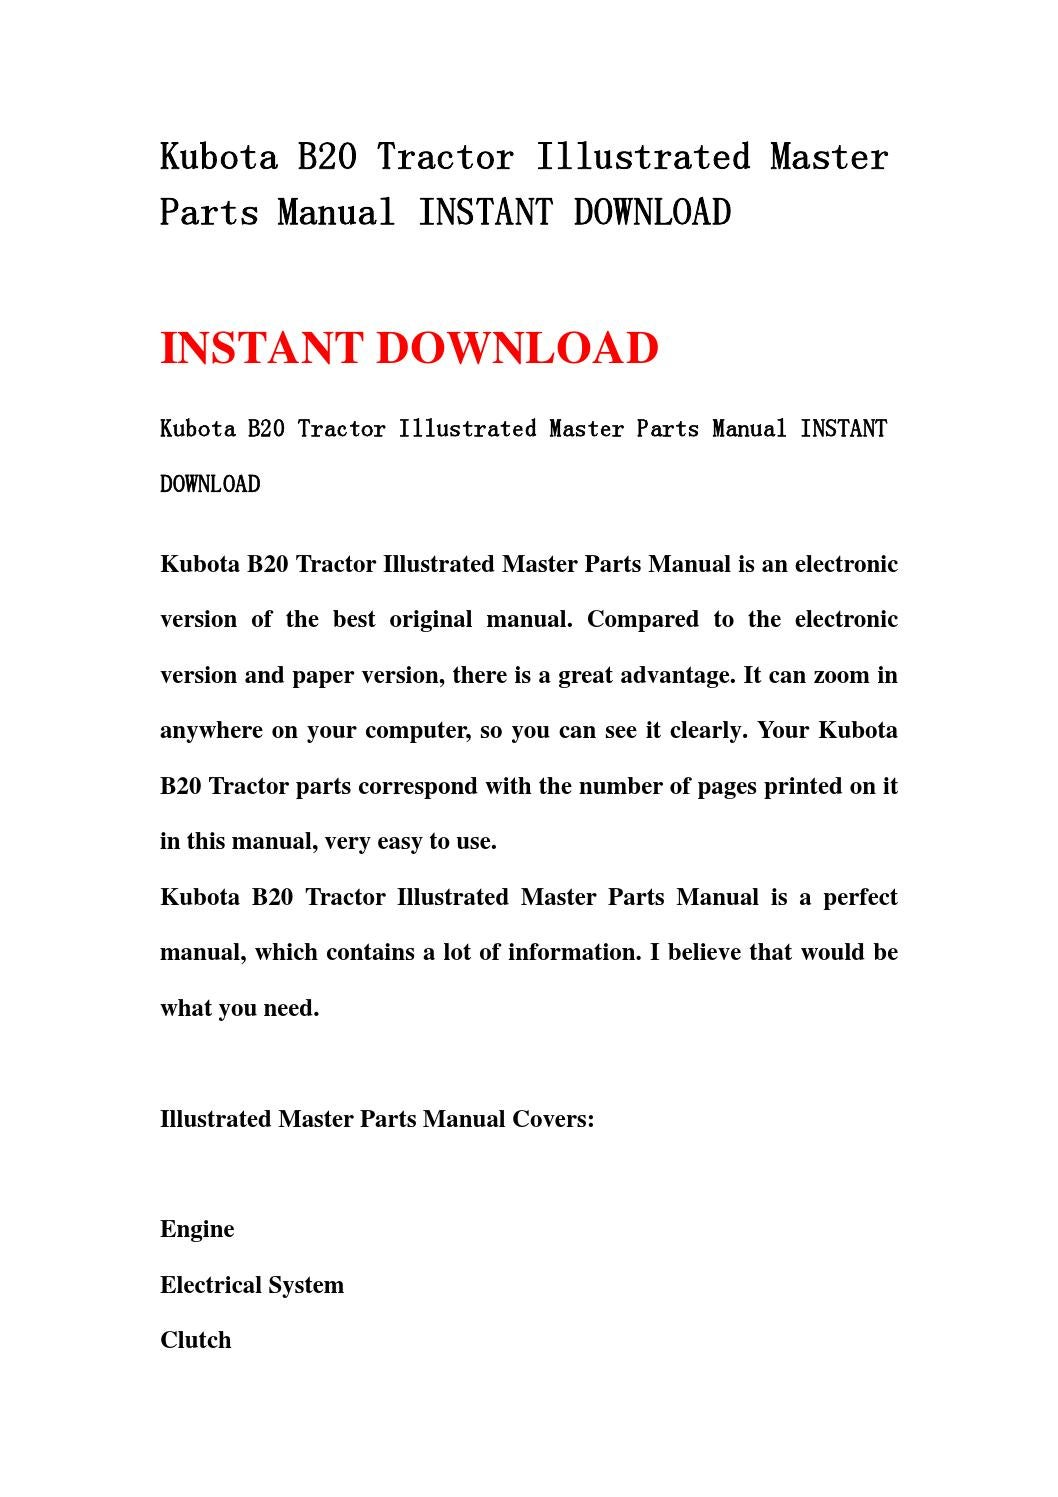 Kubota b20 tractor illustrated master parts manual instant download by  ksmefn mfjnse - issuu